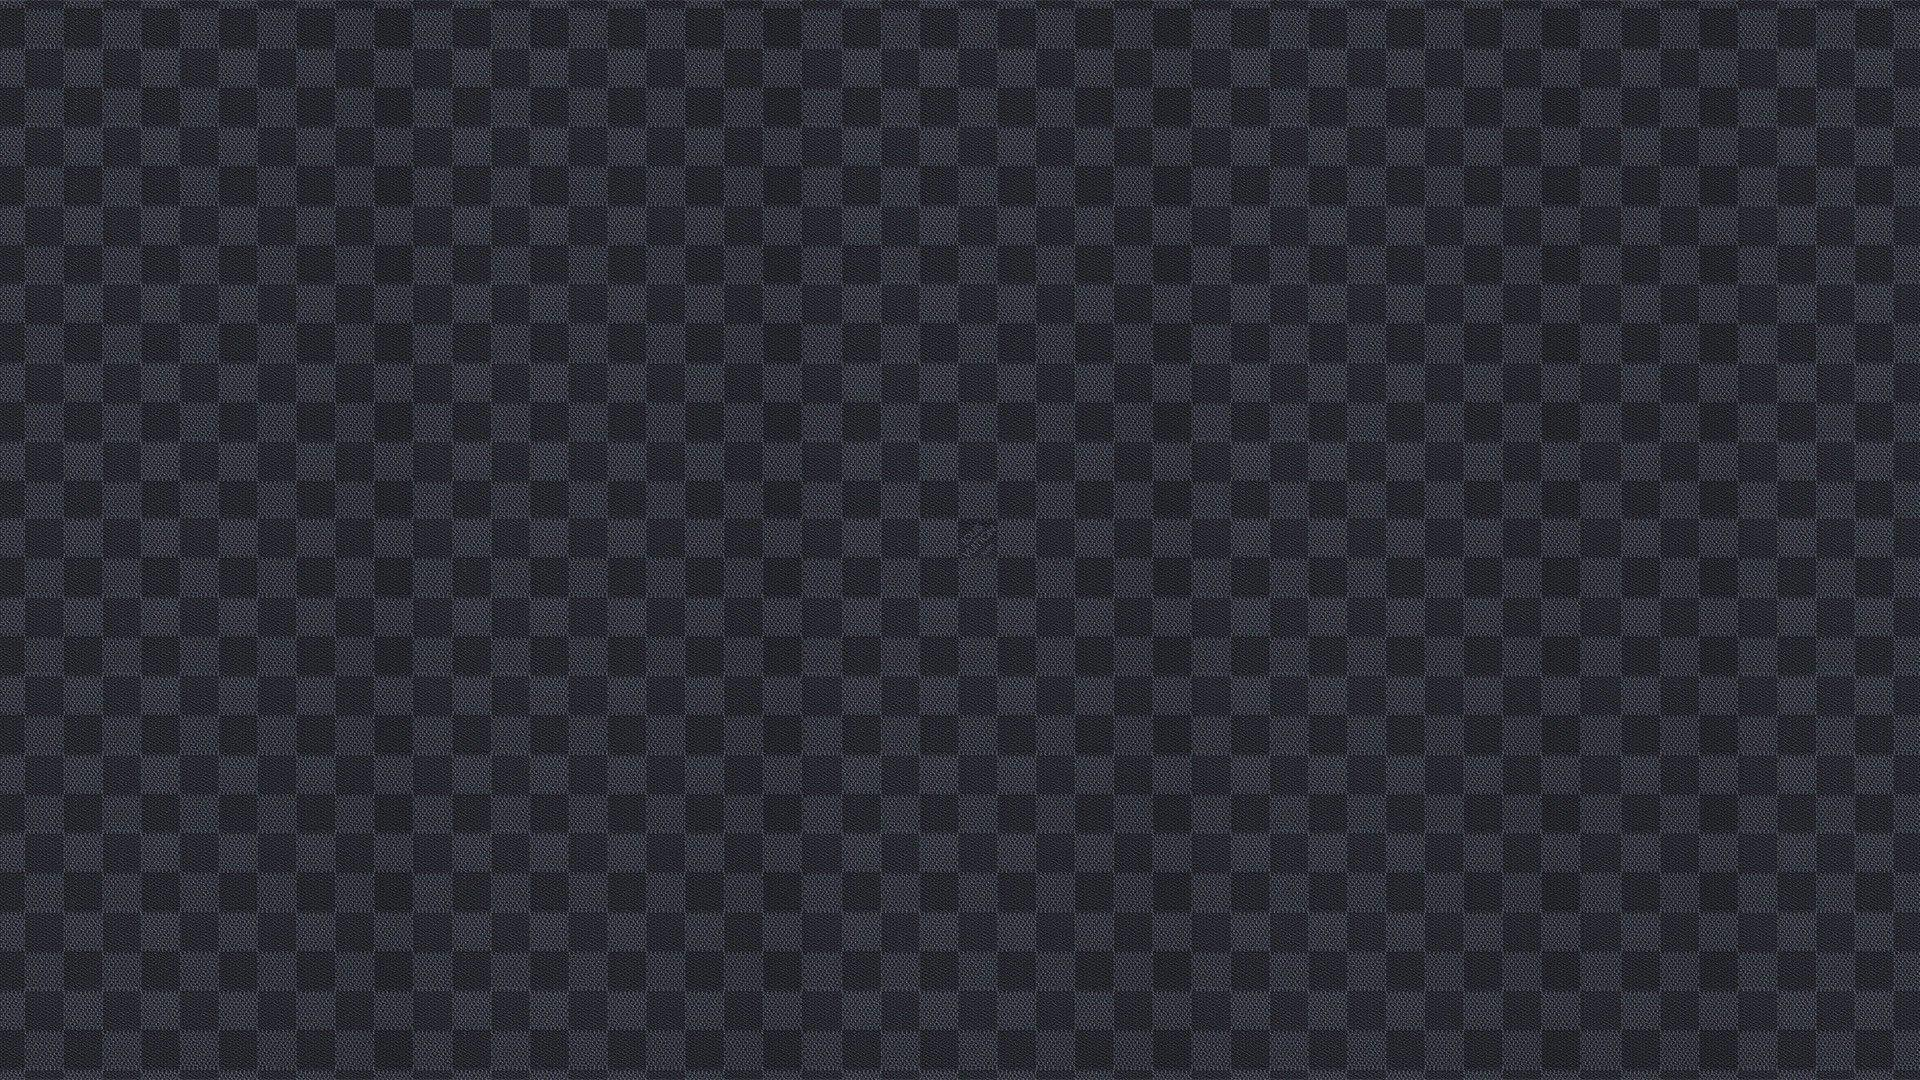 Interior Design : Hd Wallpapers Louis Vuitton Desktop × Wallpaper ...